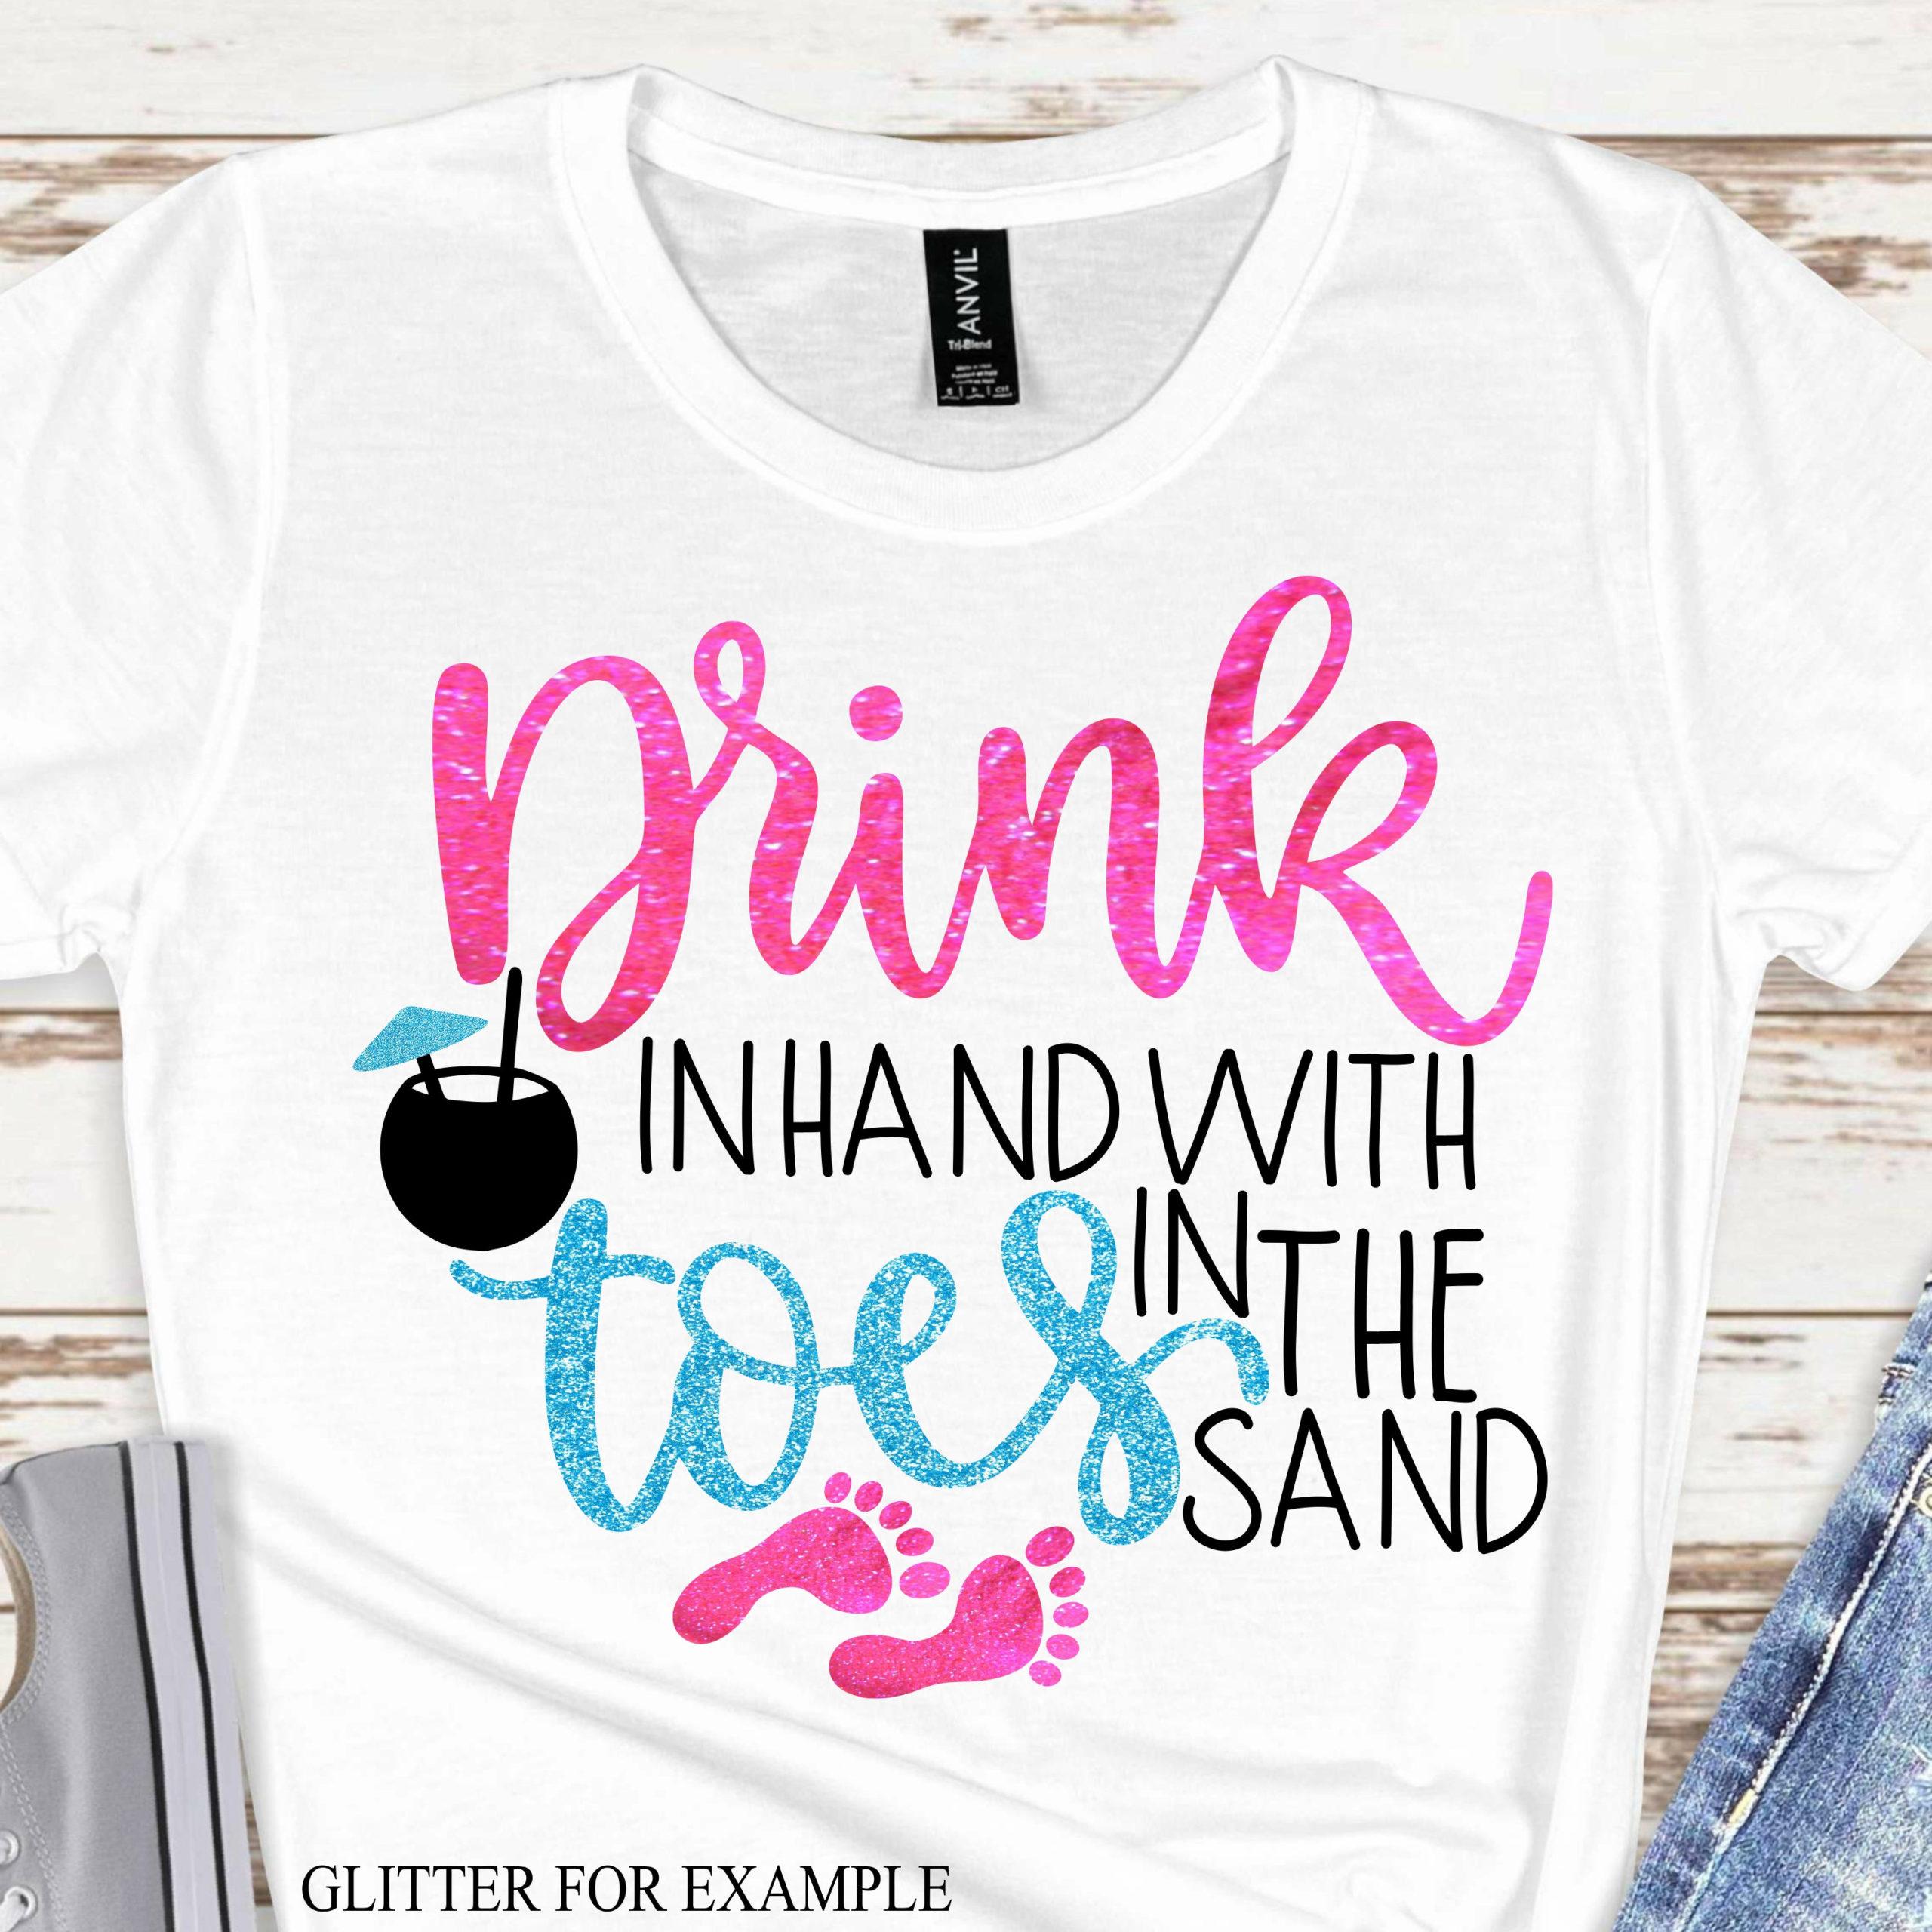 Drink-in-hand-svg-toes-in-sandbeach-svg-palm-tree-svg-summer-svg-summertime-svgbeach-life-svg-beachy-svg-for-cricut-retro-beach-svg-5ef78cad